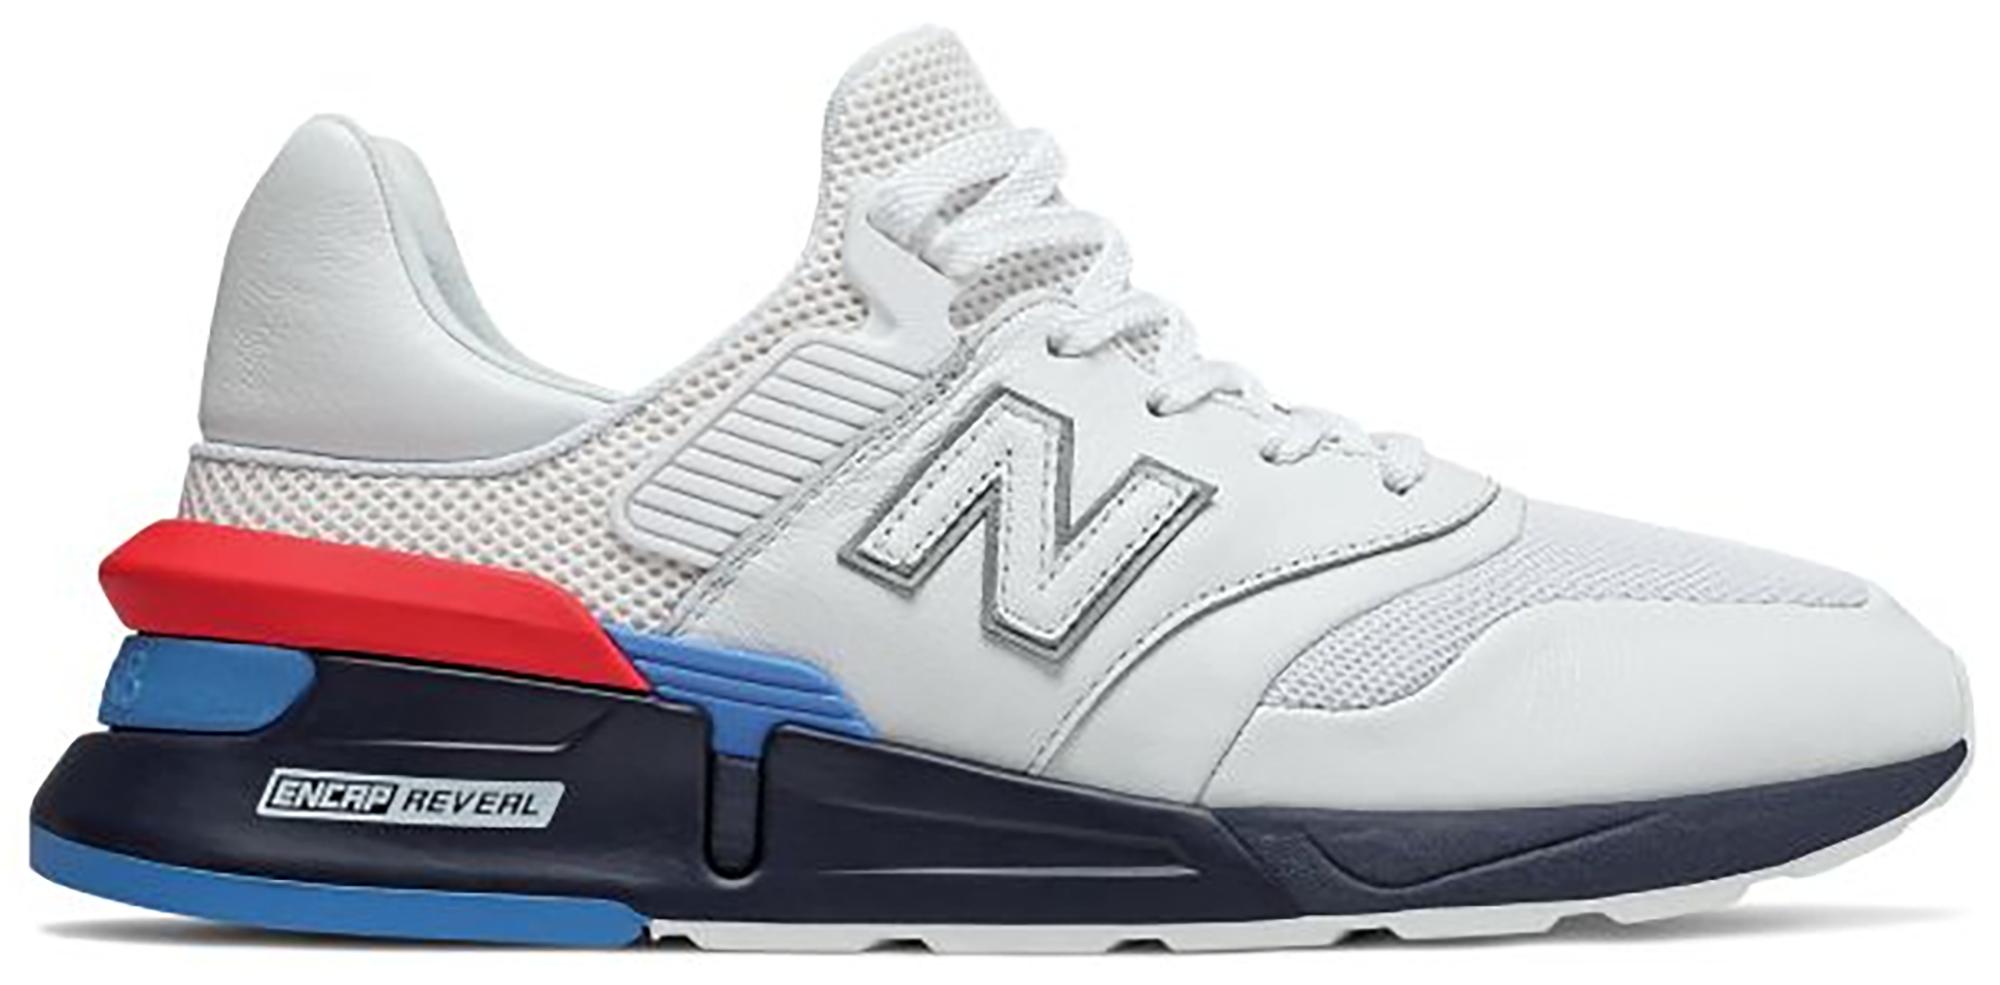 new balance 997s white